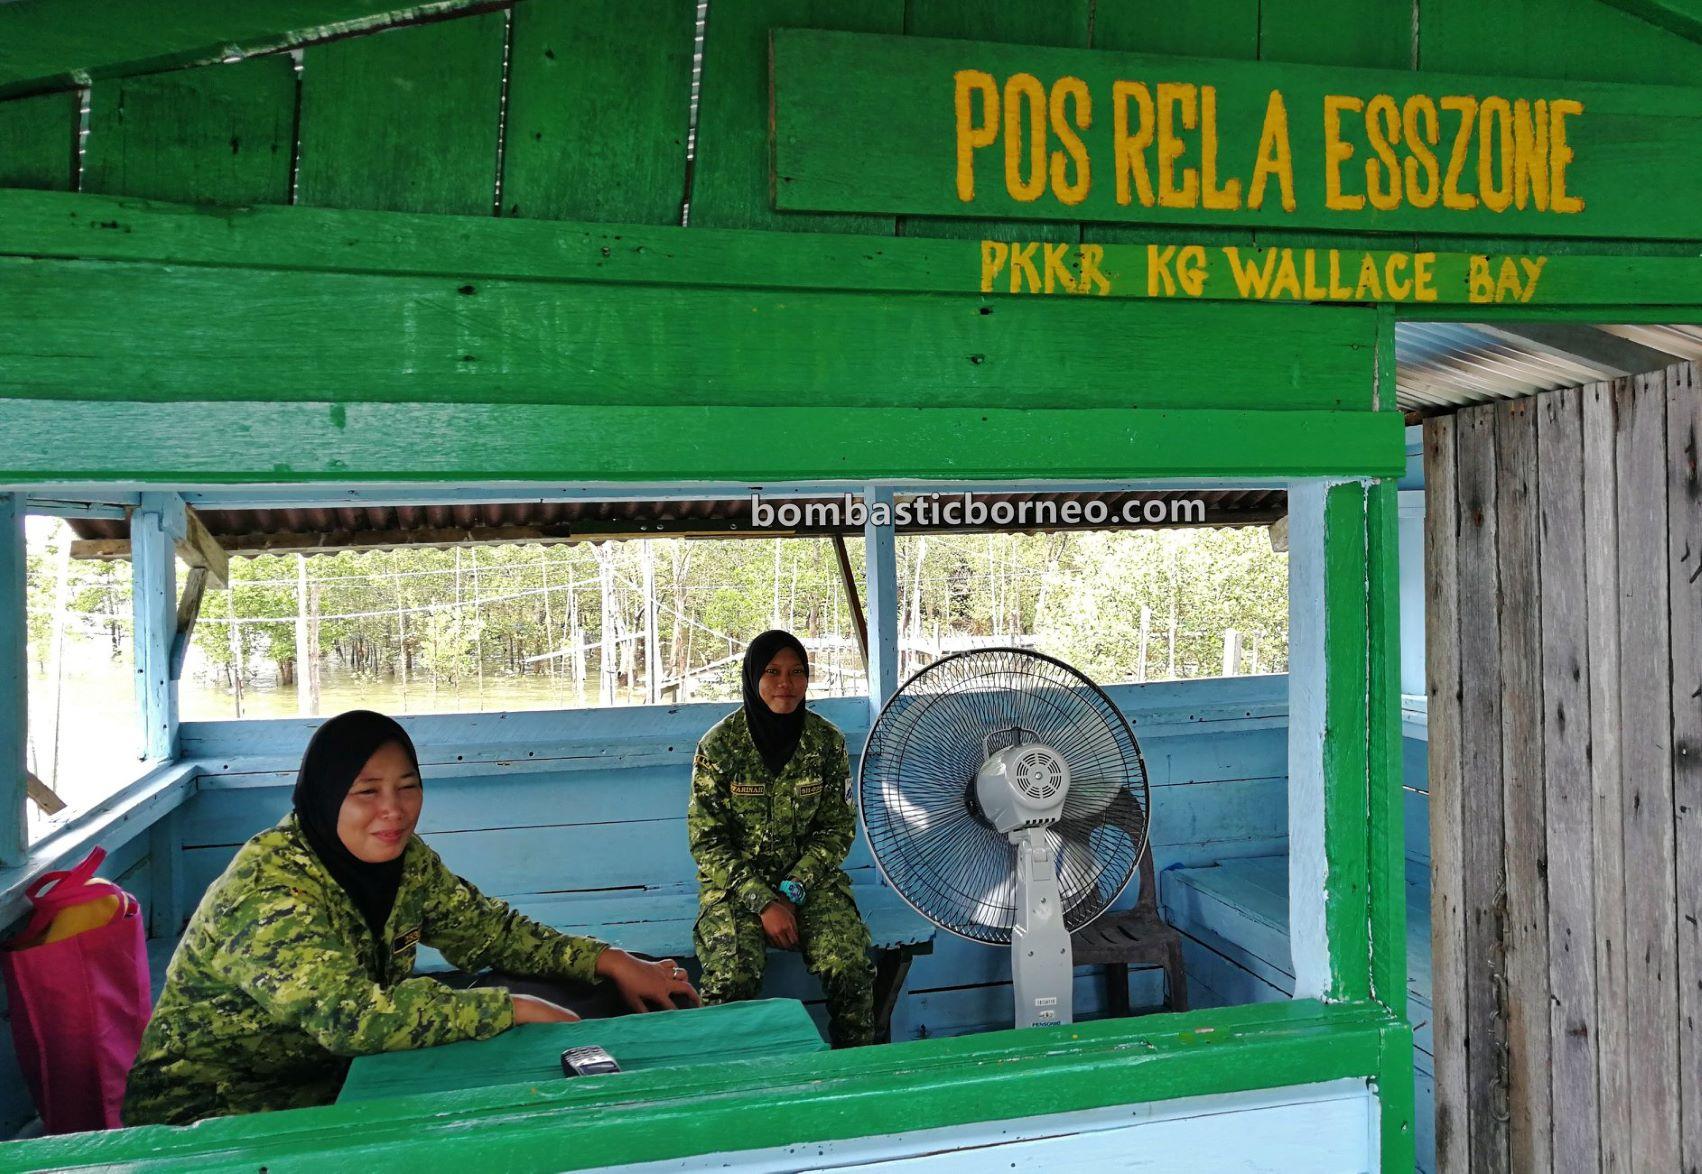 exploration, jelajah, Kampung Melayu, malay village, Malaysia, Bergosong, Mentadak Baru, Tongkang, Travel Guide, Borneo,